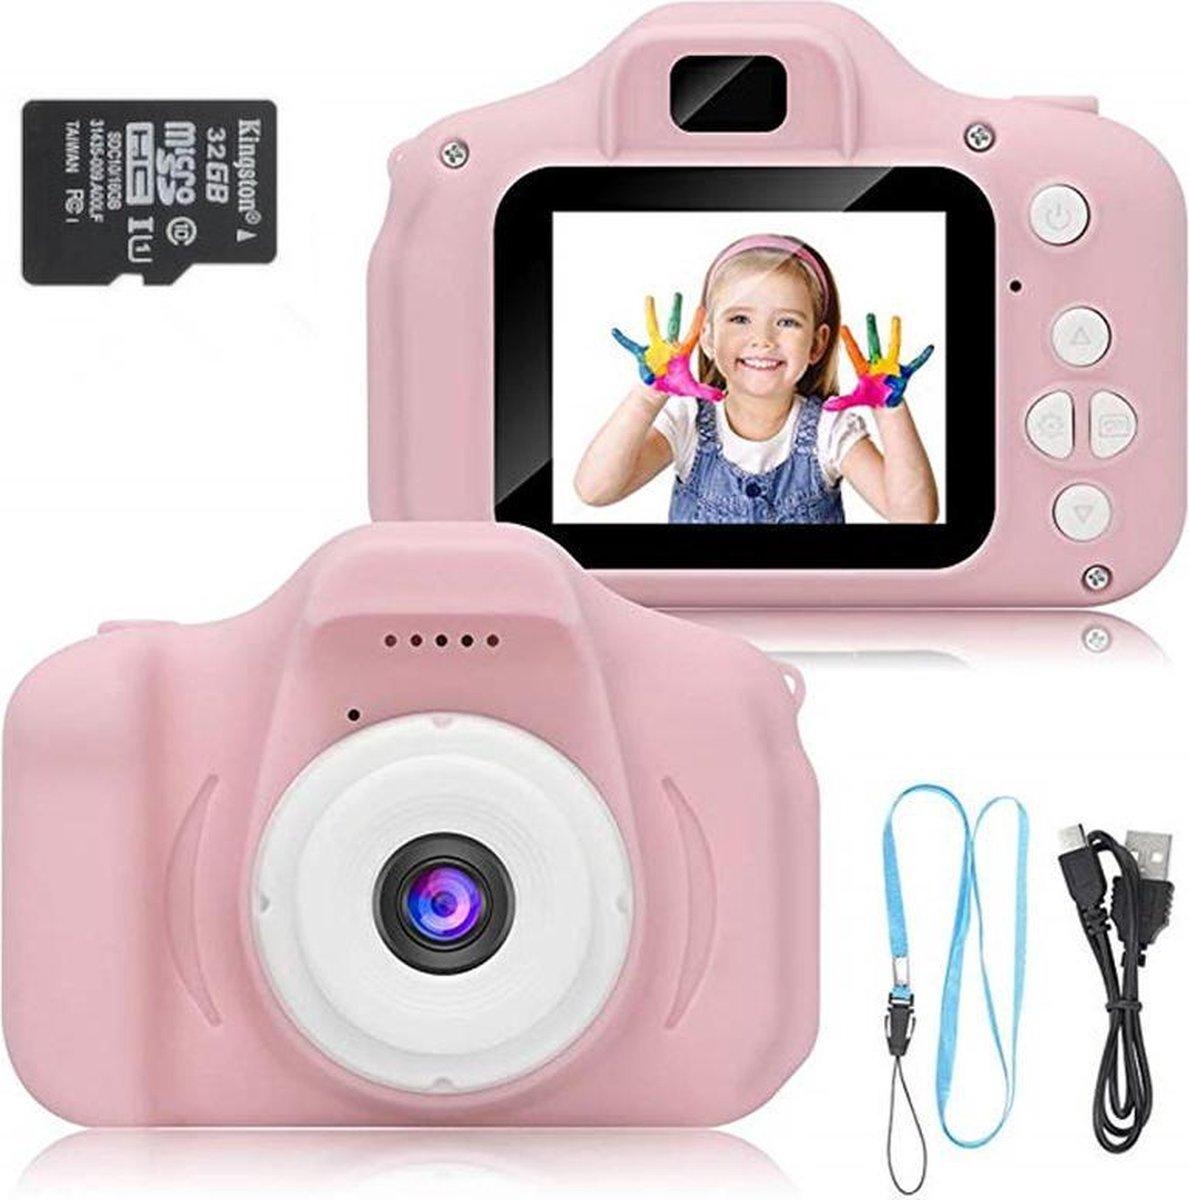 Jukxo Kindercamera Roze   Inclusief 5 Spellen en 32GB SD-kaart   Digitale Kindercamera -Kinderfototo